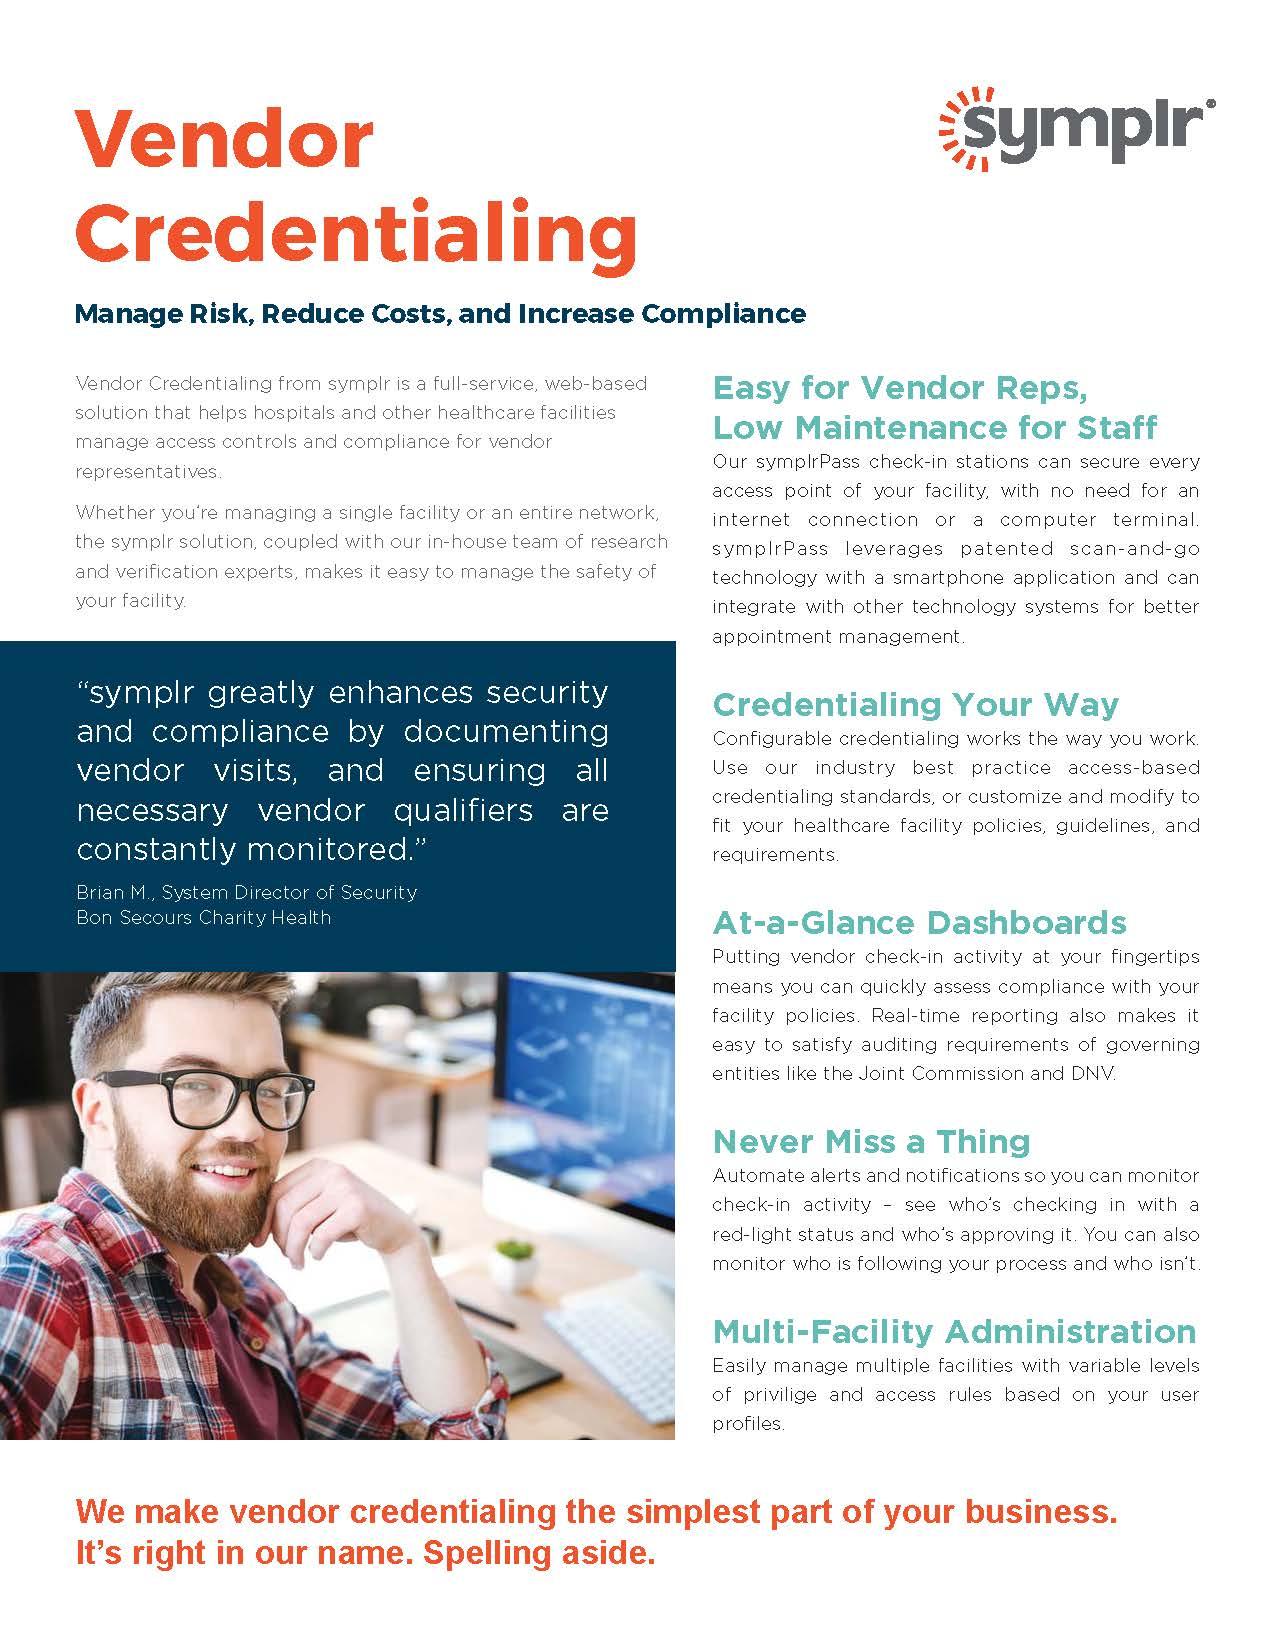 Vendor Credentialing.jpg